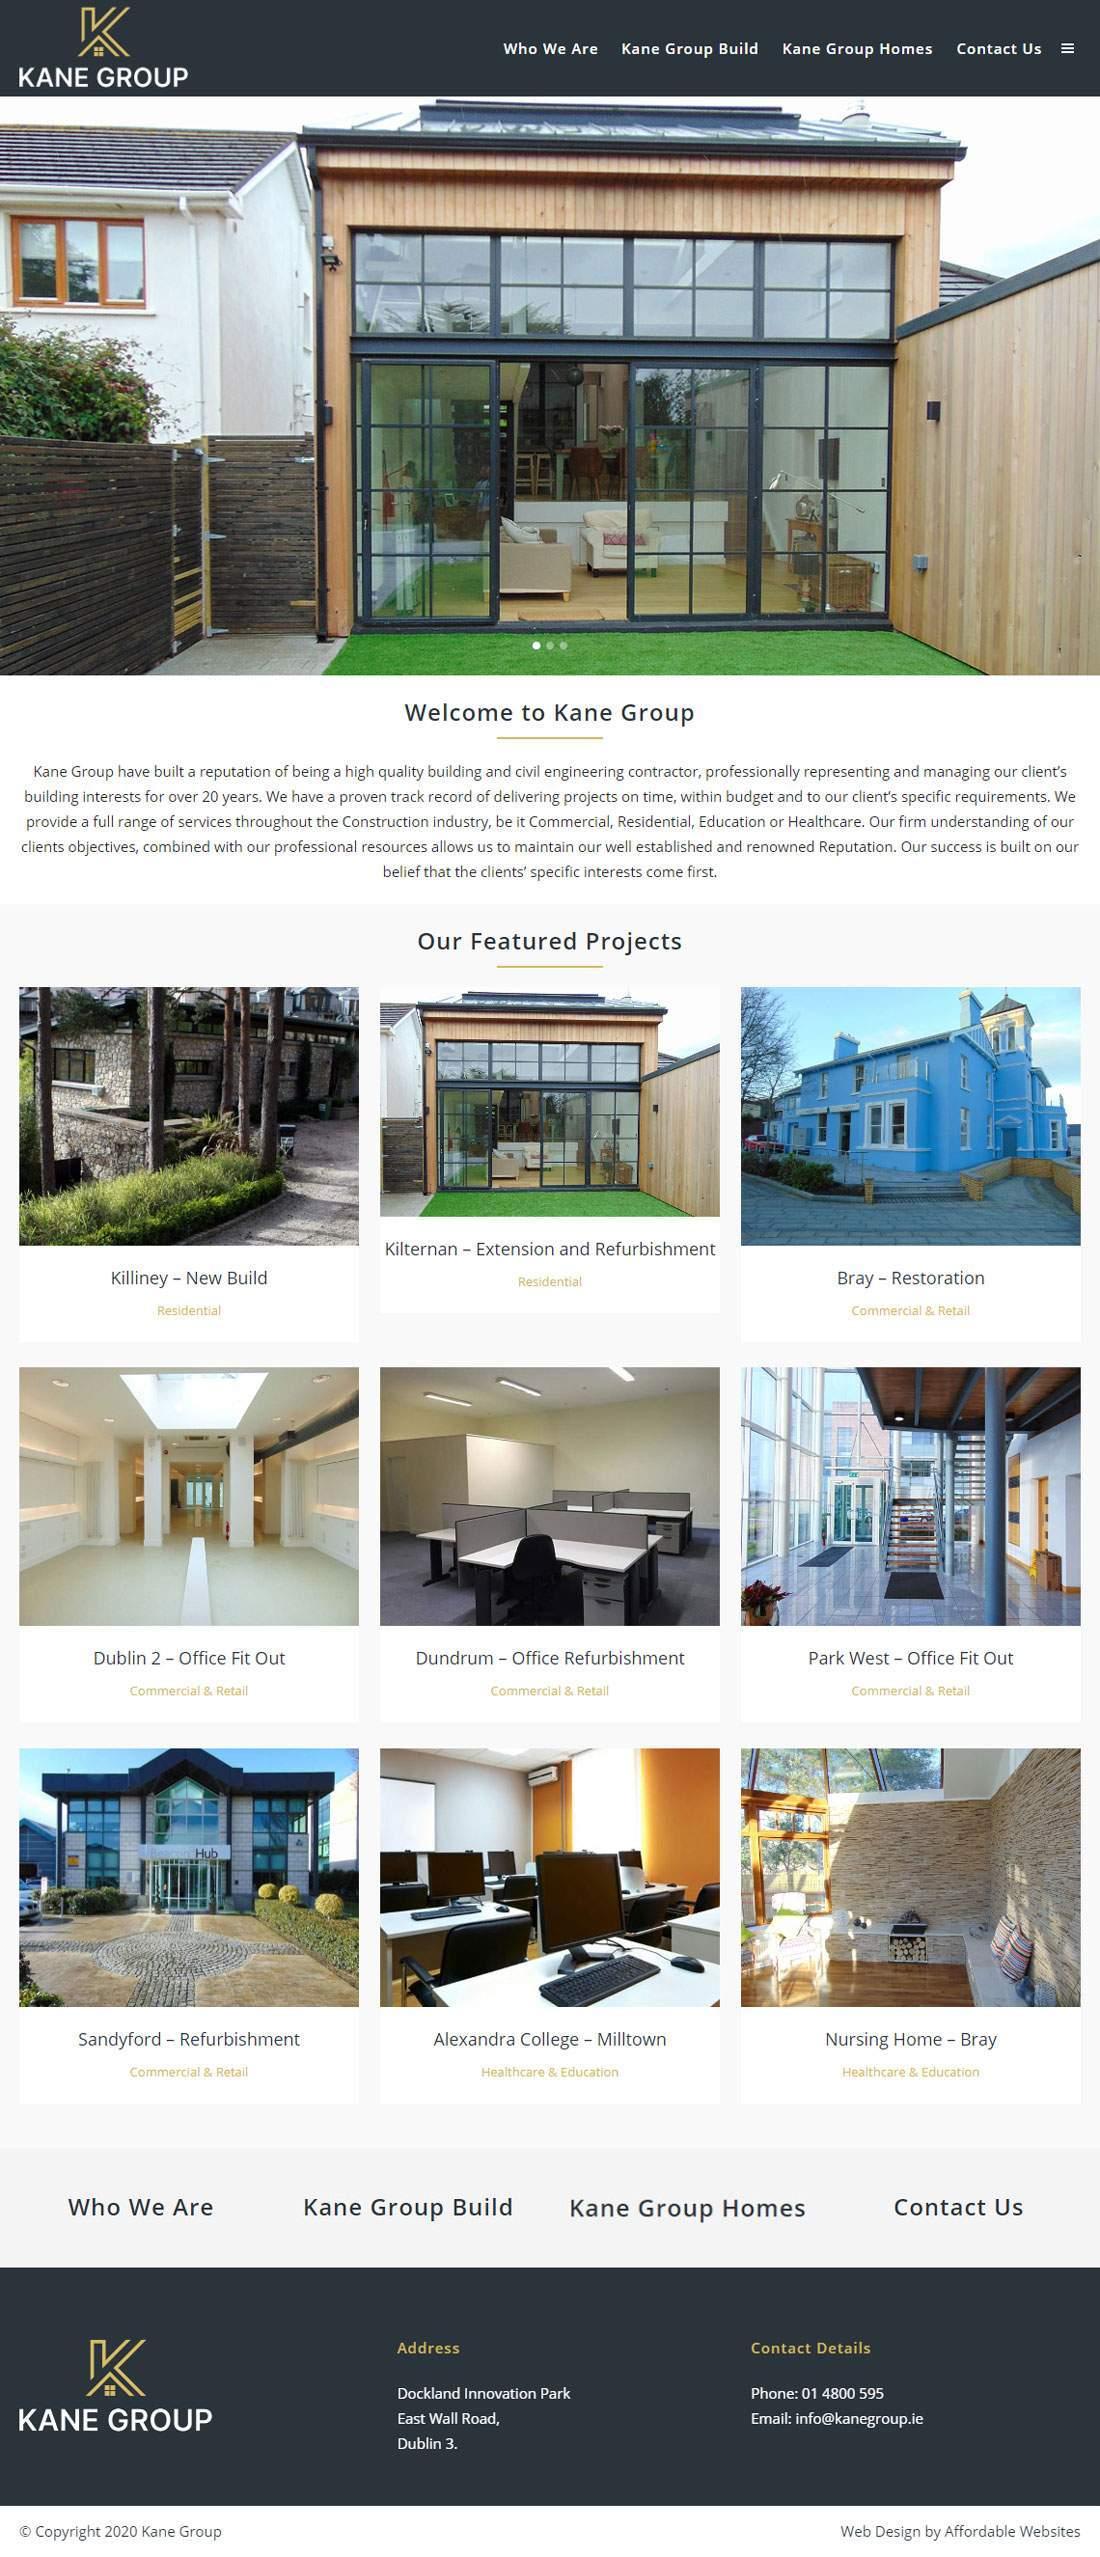 Kane Group Home Page